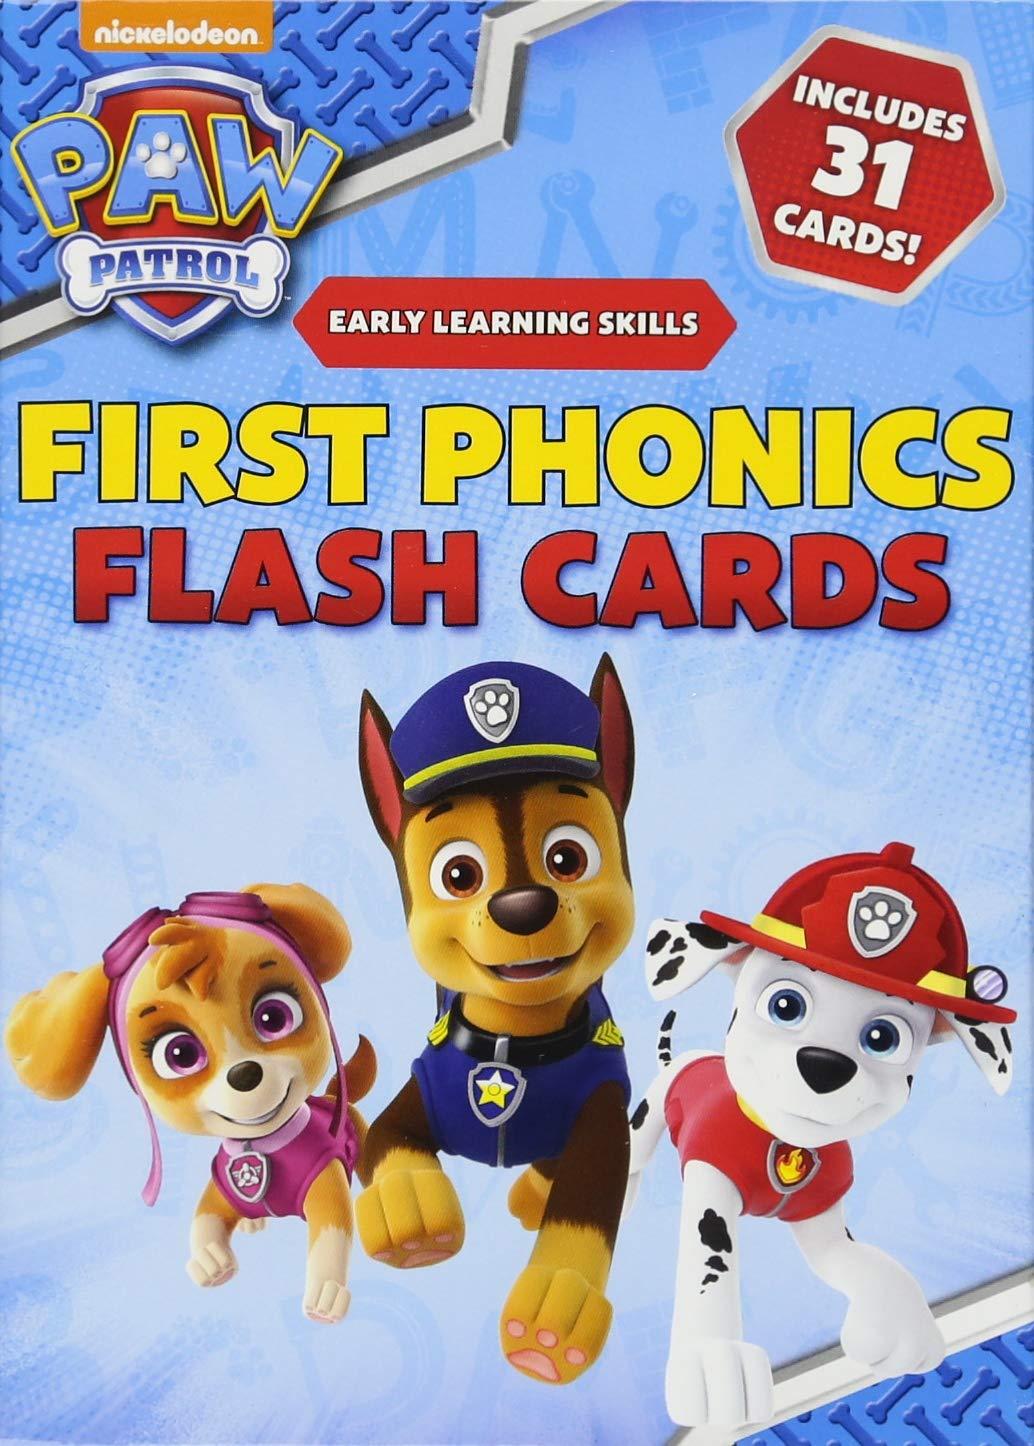 PAW Patrol First Phonics Flash Cards